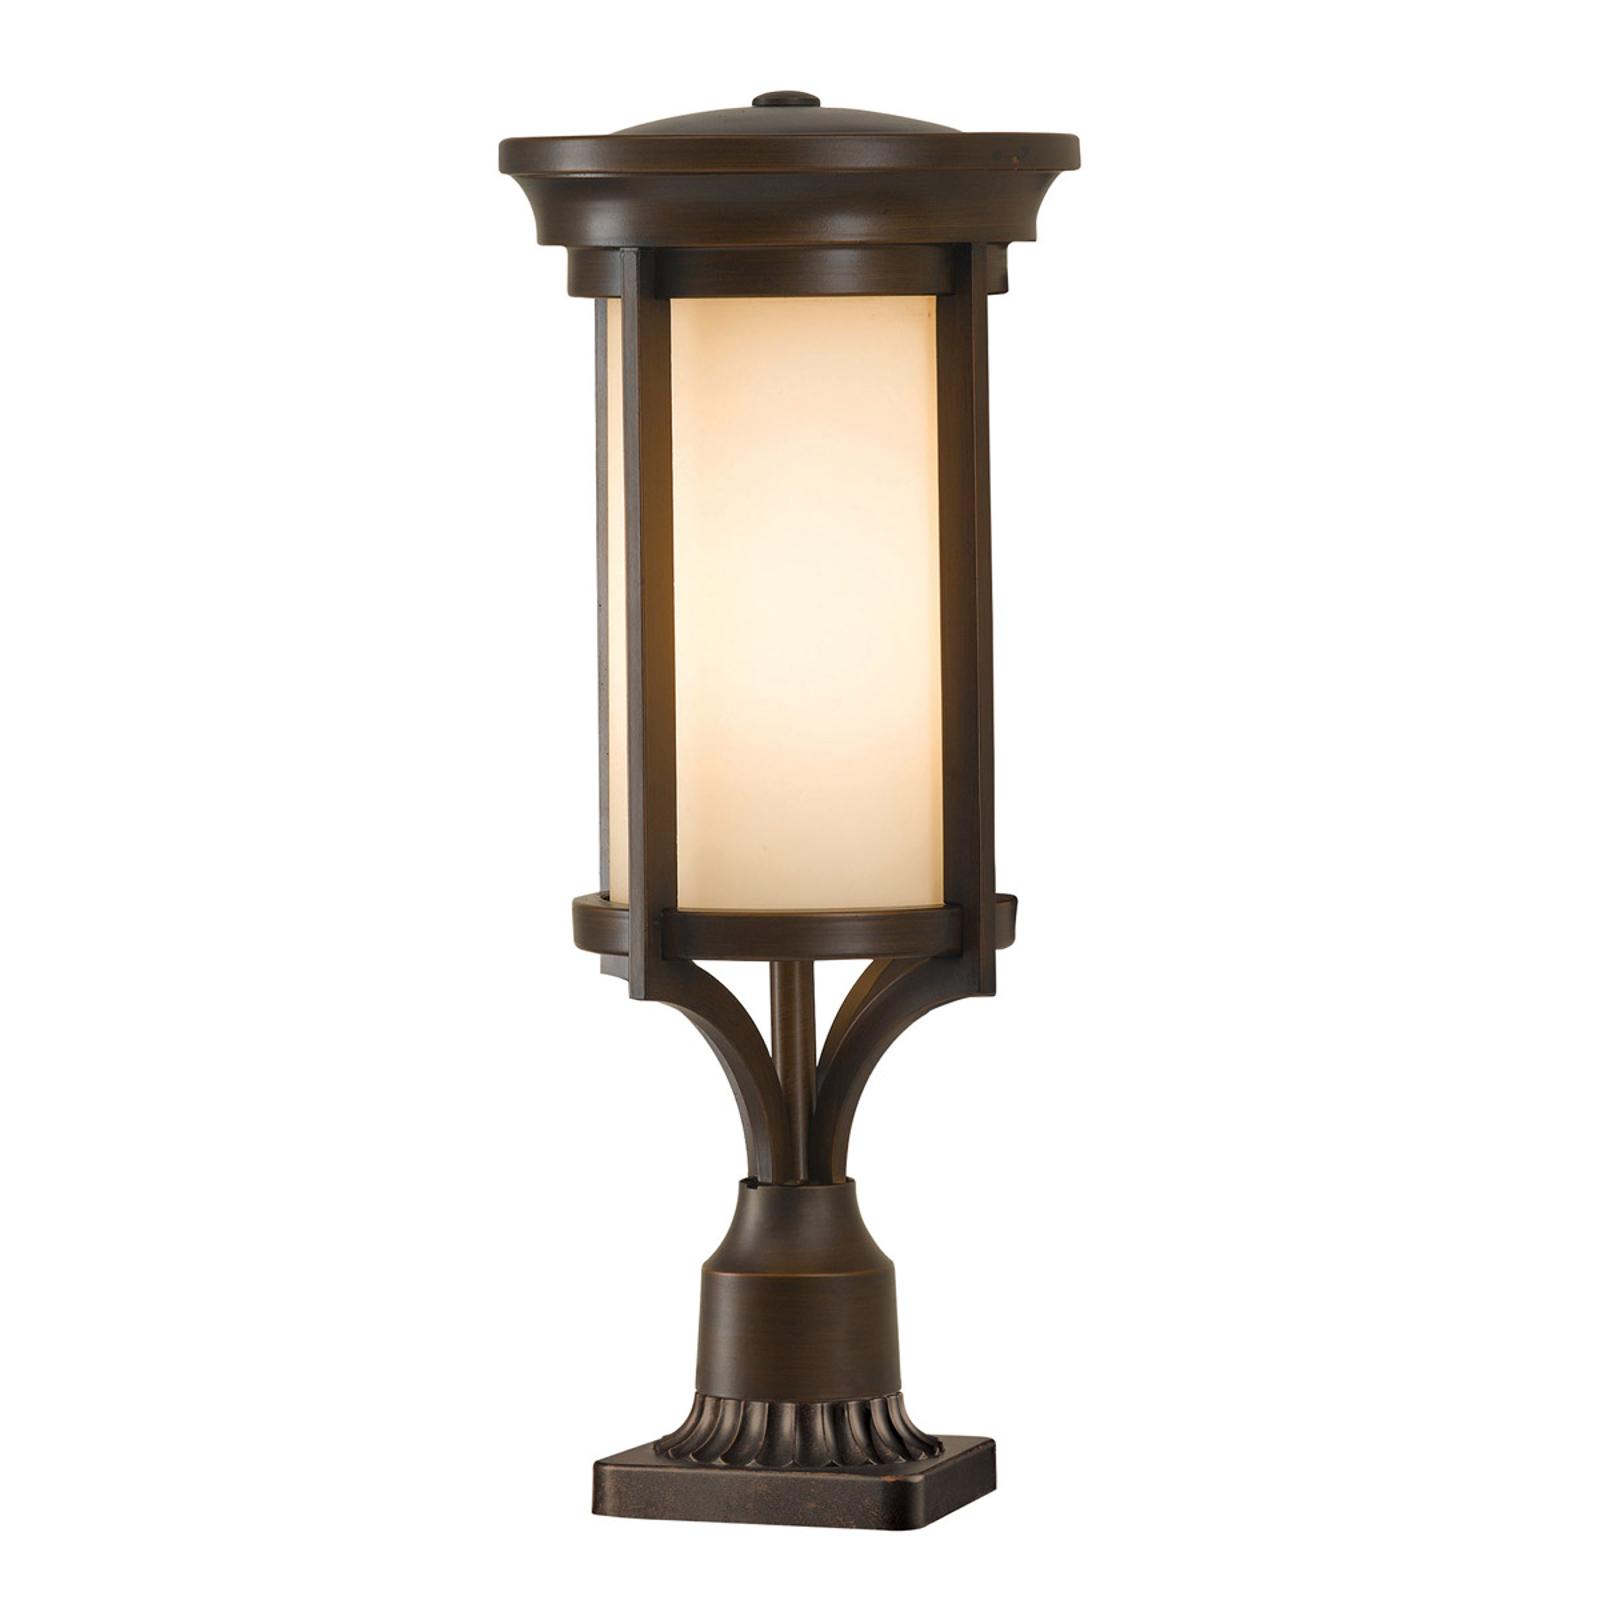 Pedestal light Merrill_3048371_1